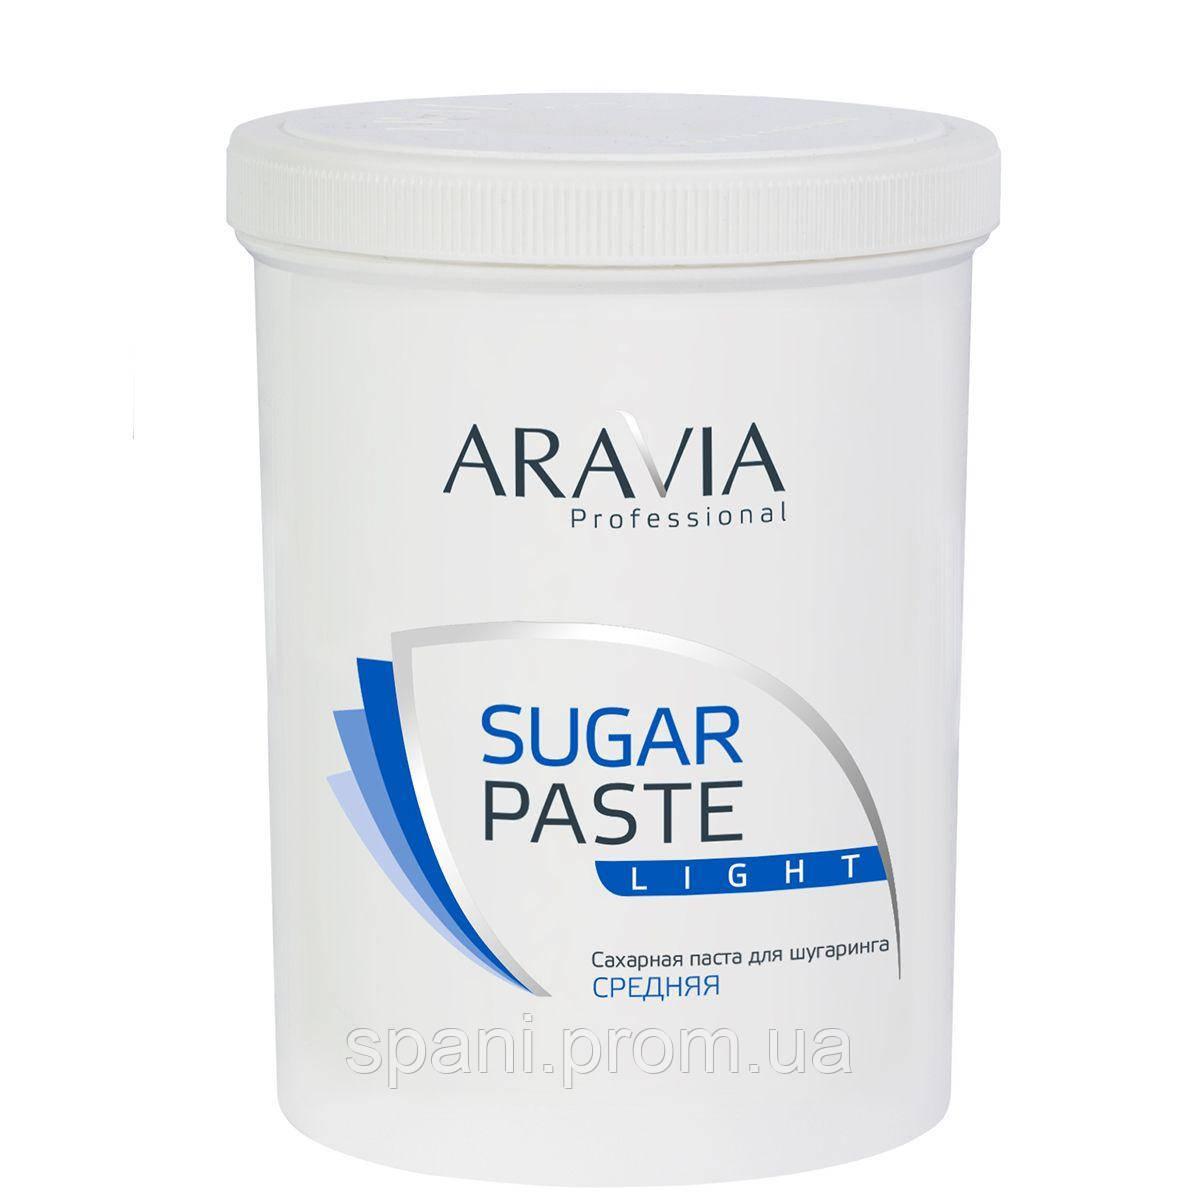 """ARAVIA Professional"" Сахарная паста для депиляции ""Легкая"" средней консистенции 1500 гр."